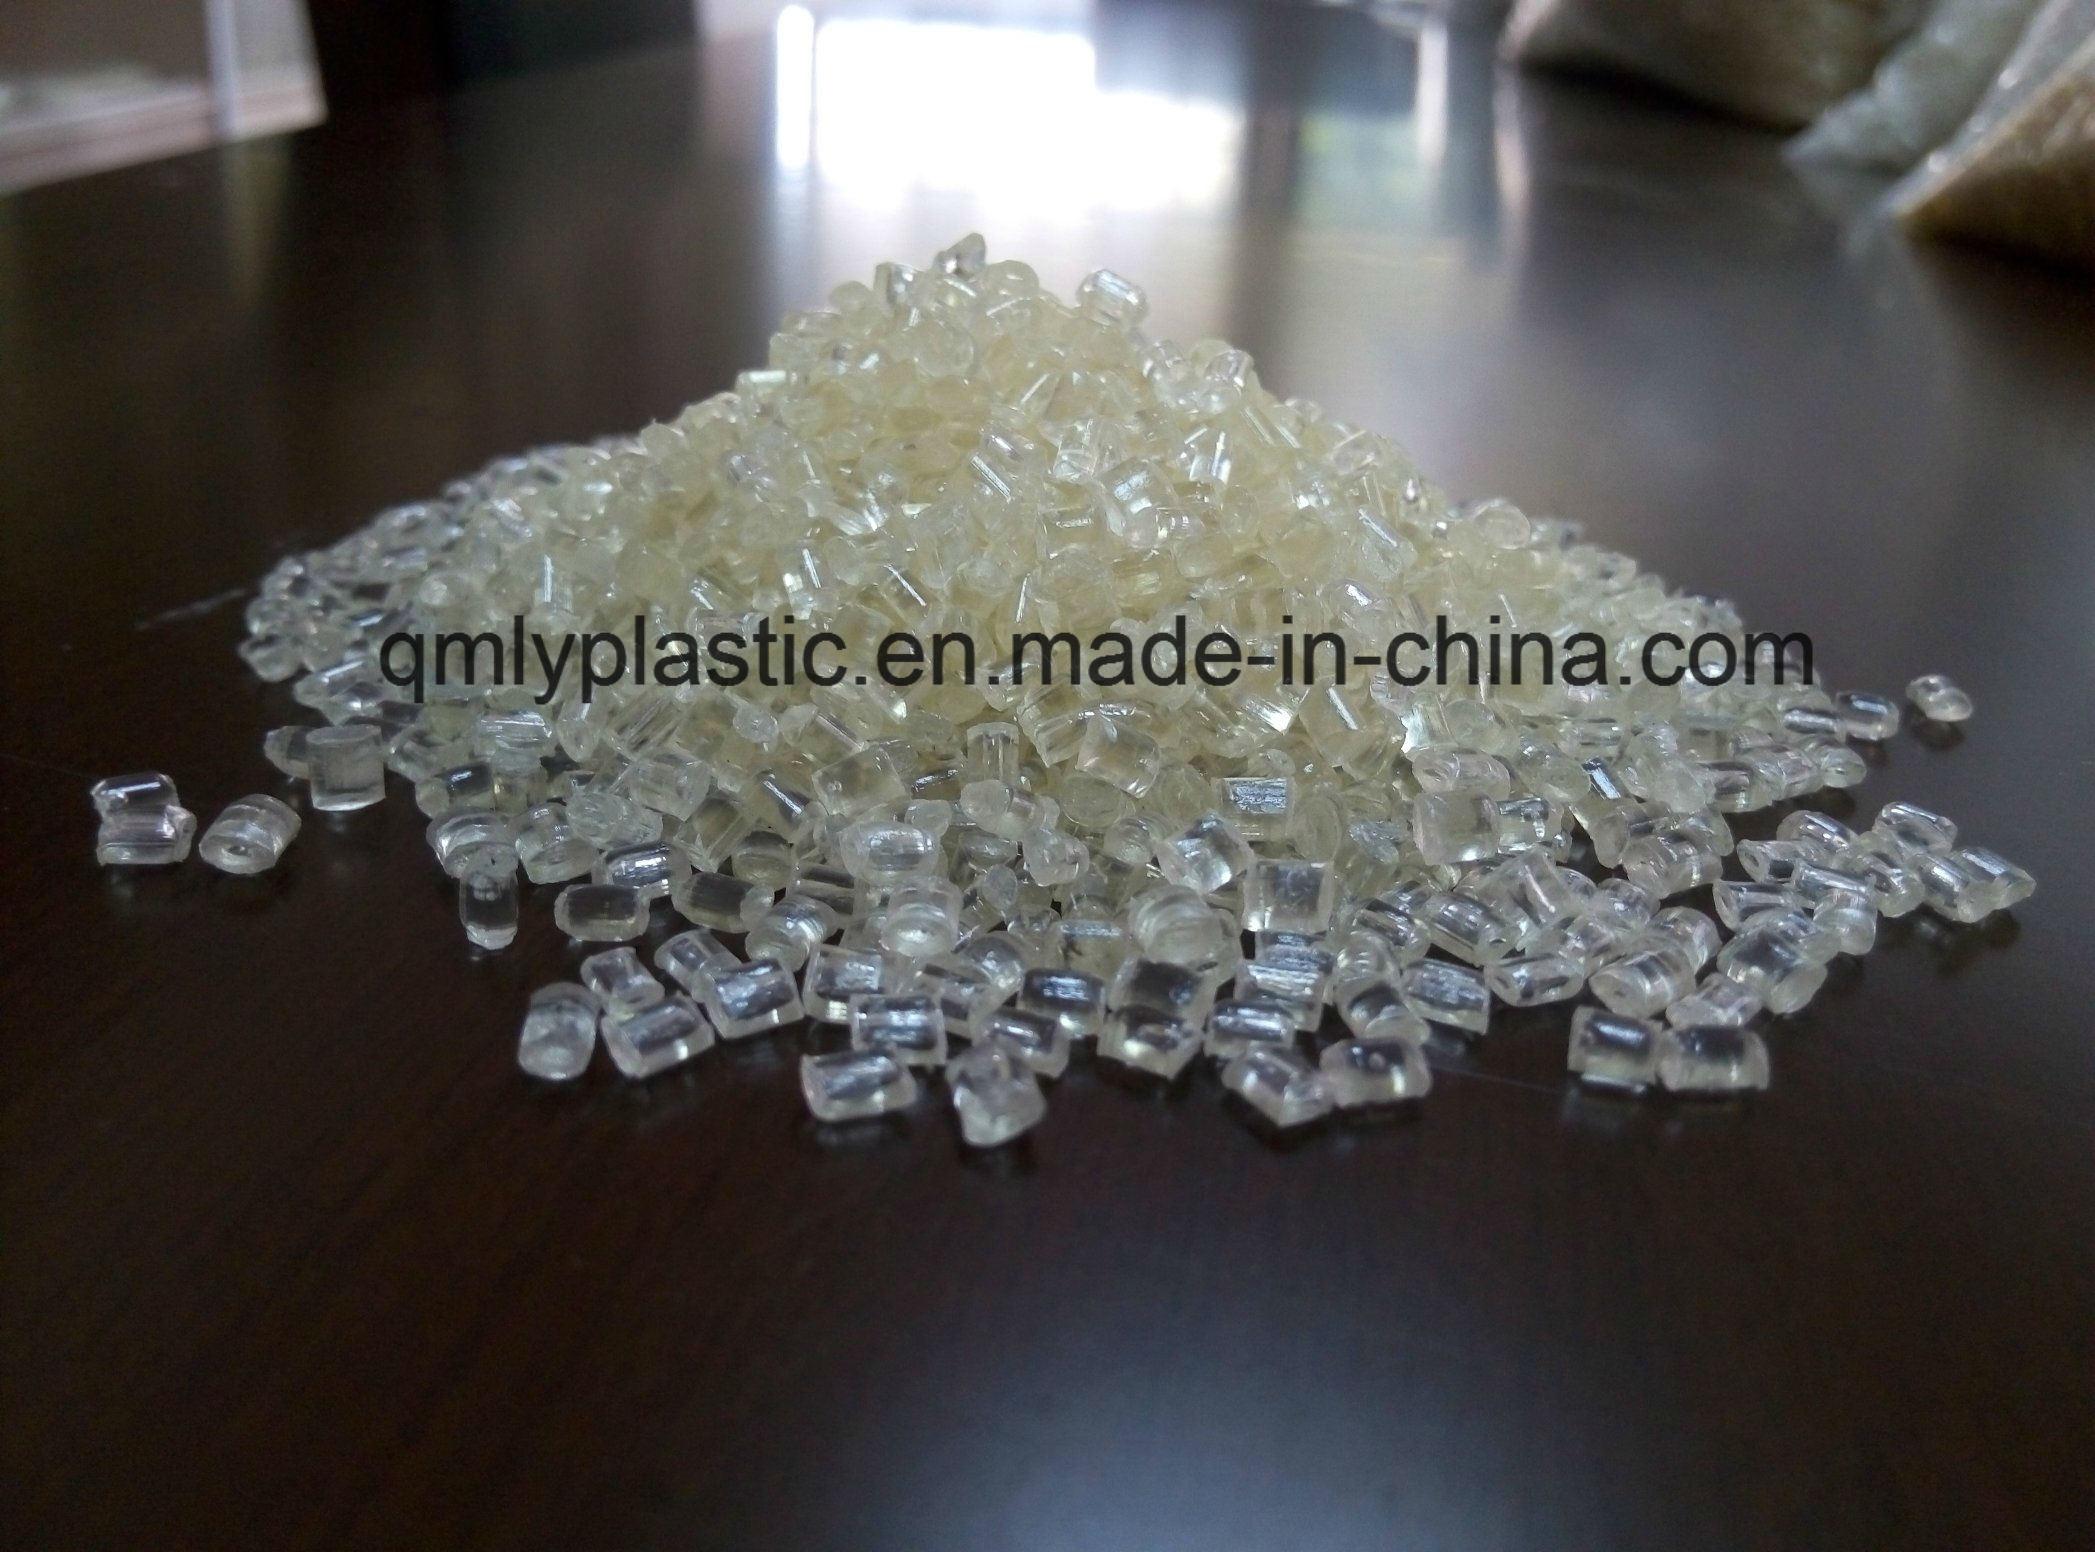 Amber PSU Polysulfon Thermoplastic Engineering Plastic Granulas